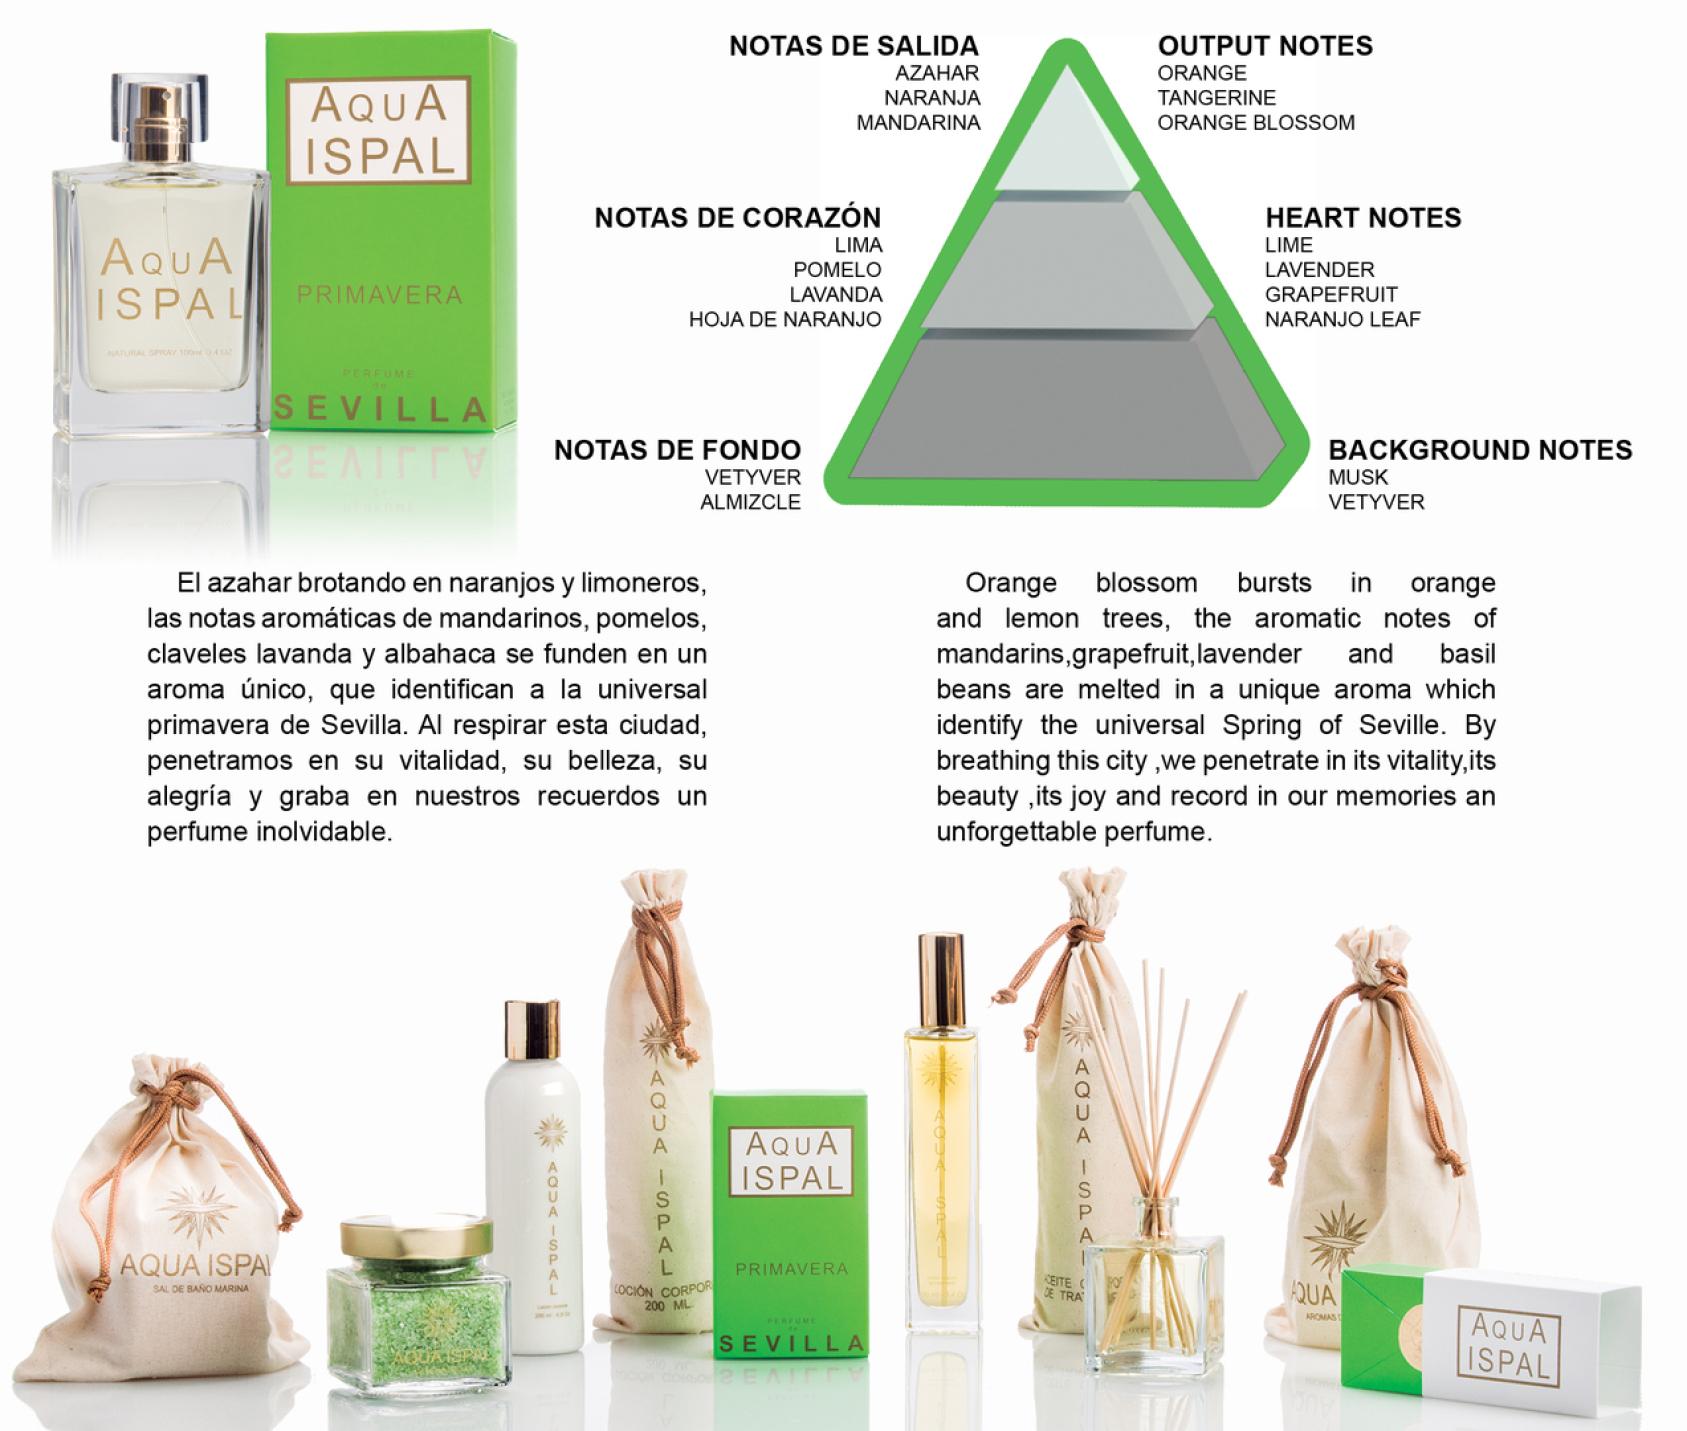 Perfume AQUA ISPAL PRIMAVERA, Perfume Sevilla, Perfume Córdoba, Perfumes de autor.